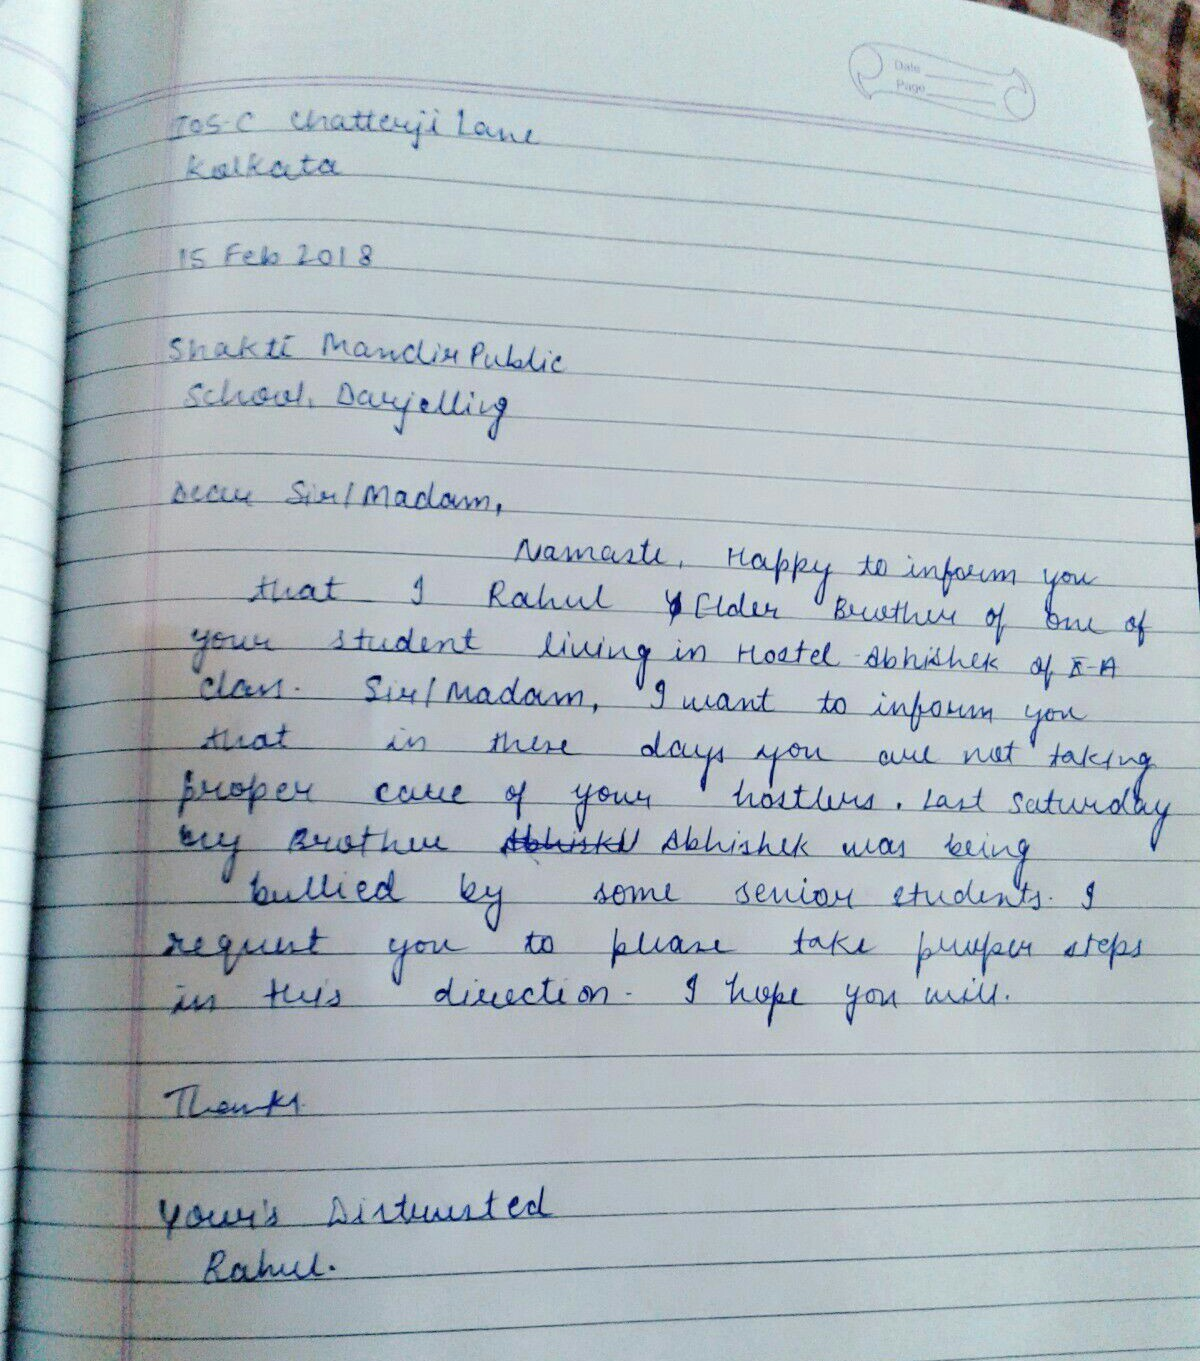 You are Rajni of 105-c,Chatterjee Lane Kolkata  You have received a